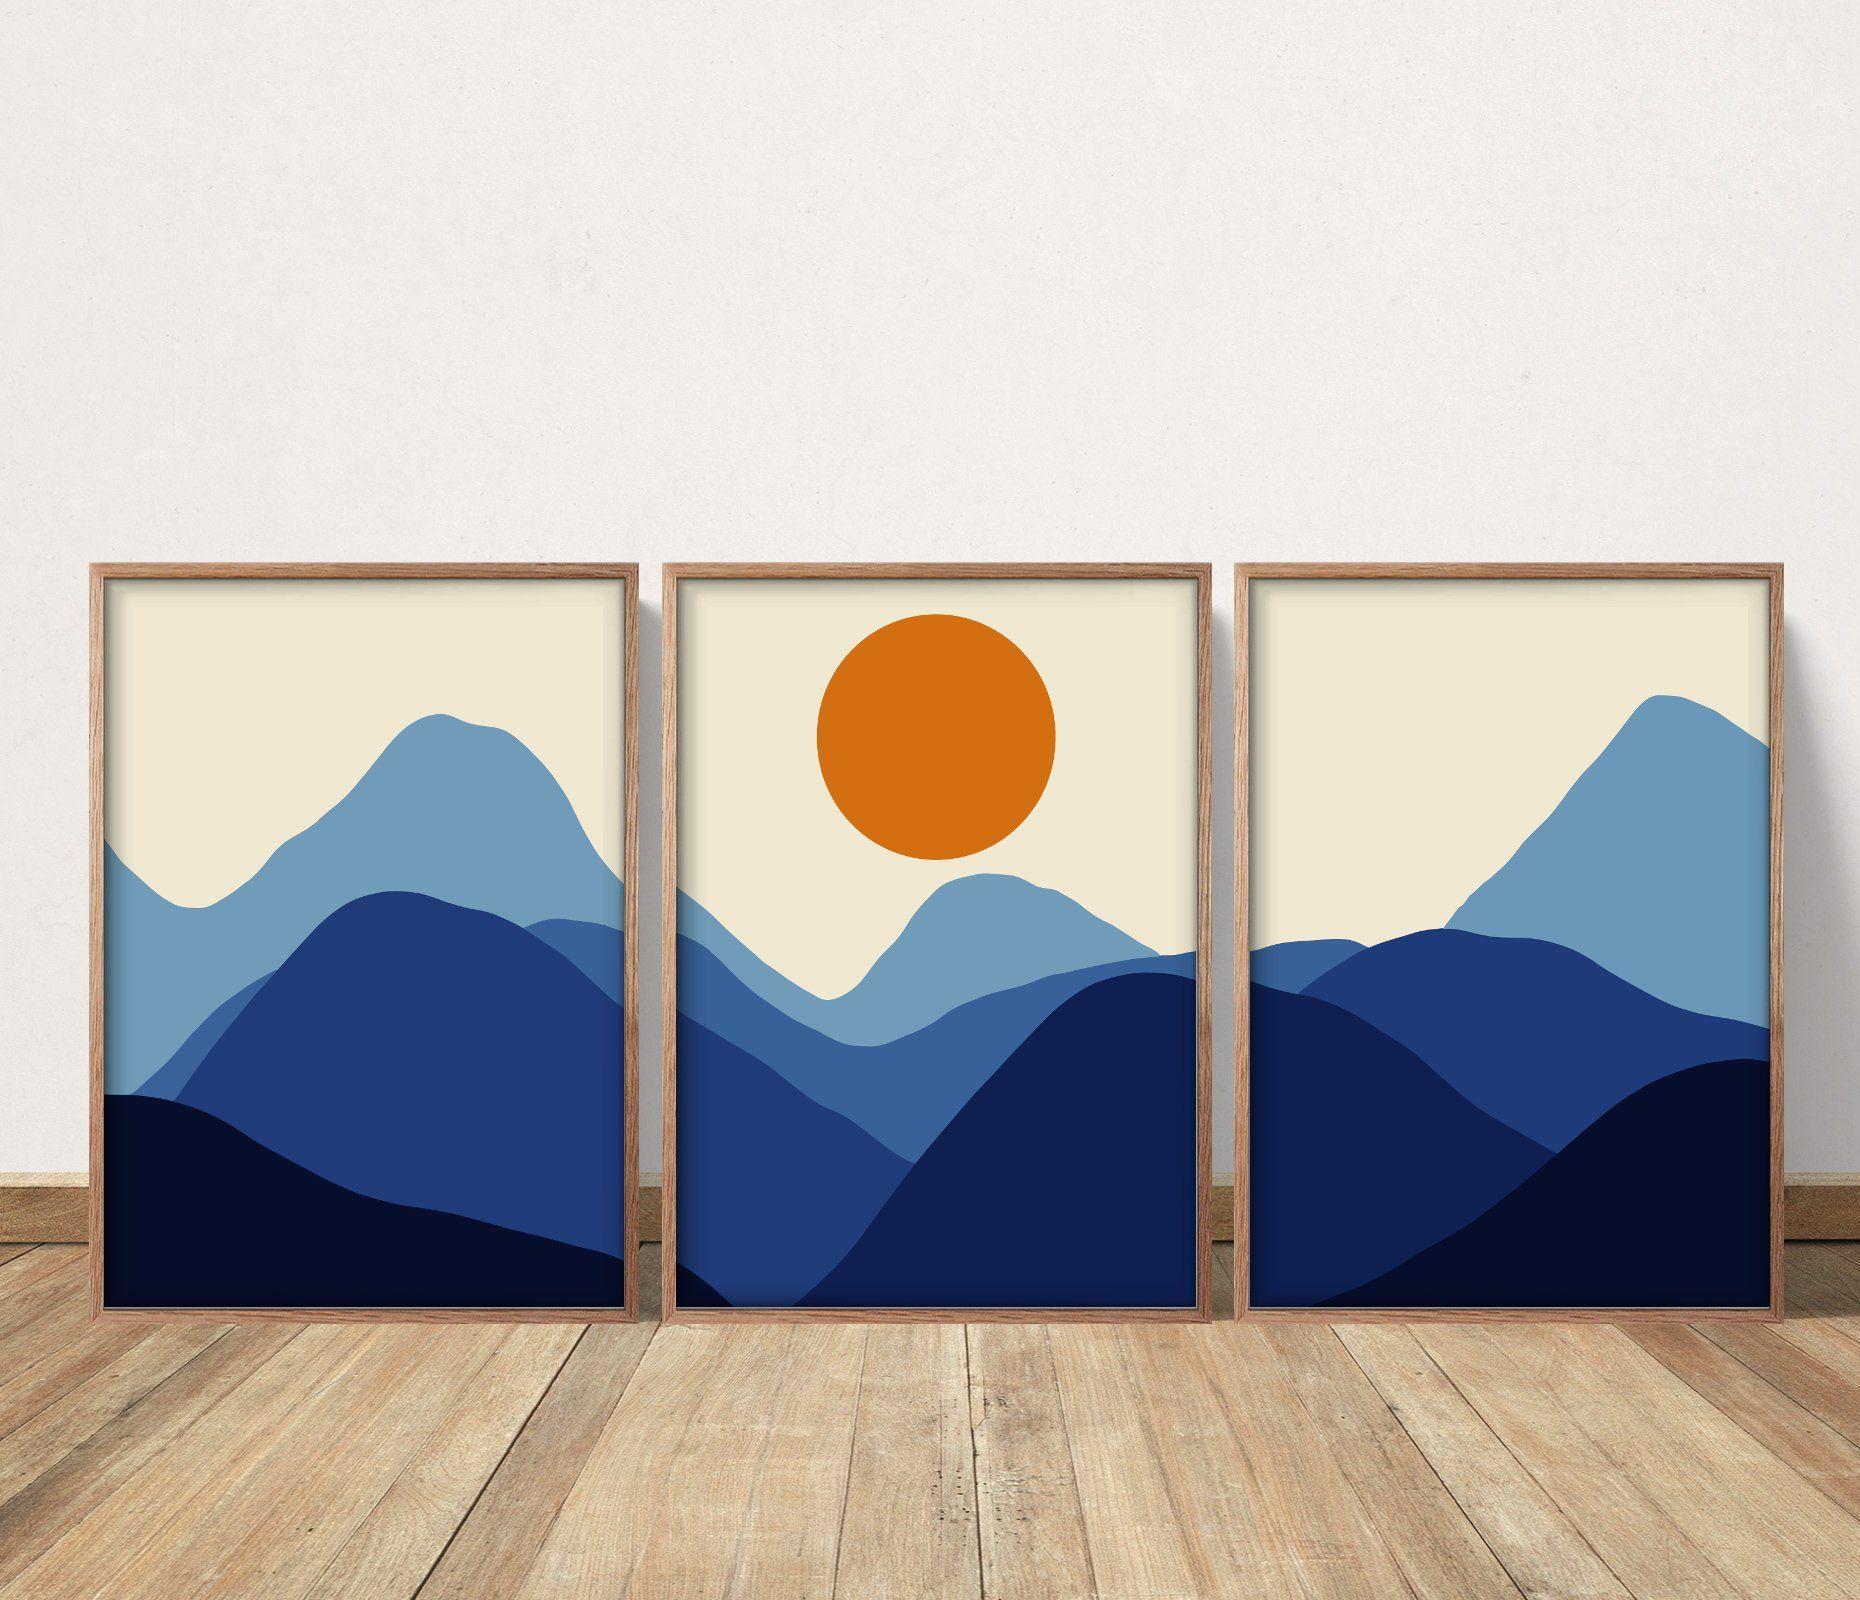 Abstract Wall Art Prints Set of 3 Modern Home Decor Mountain Scenery Geometric